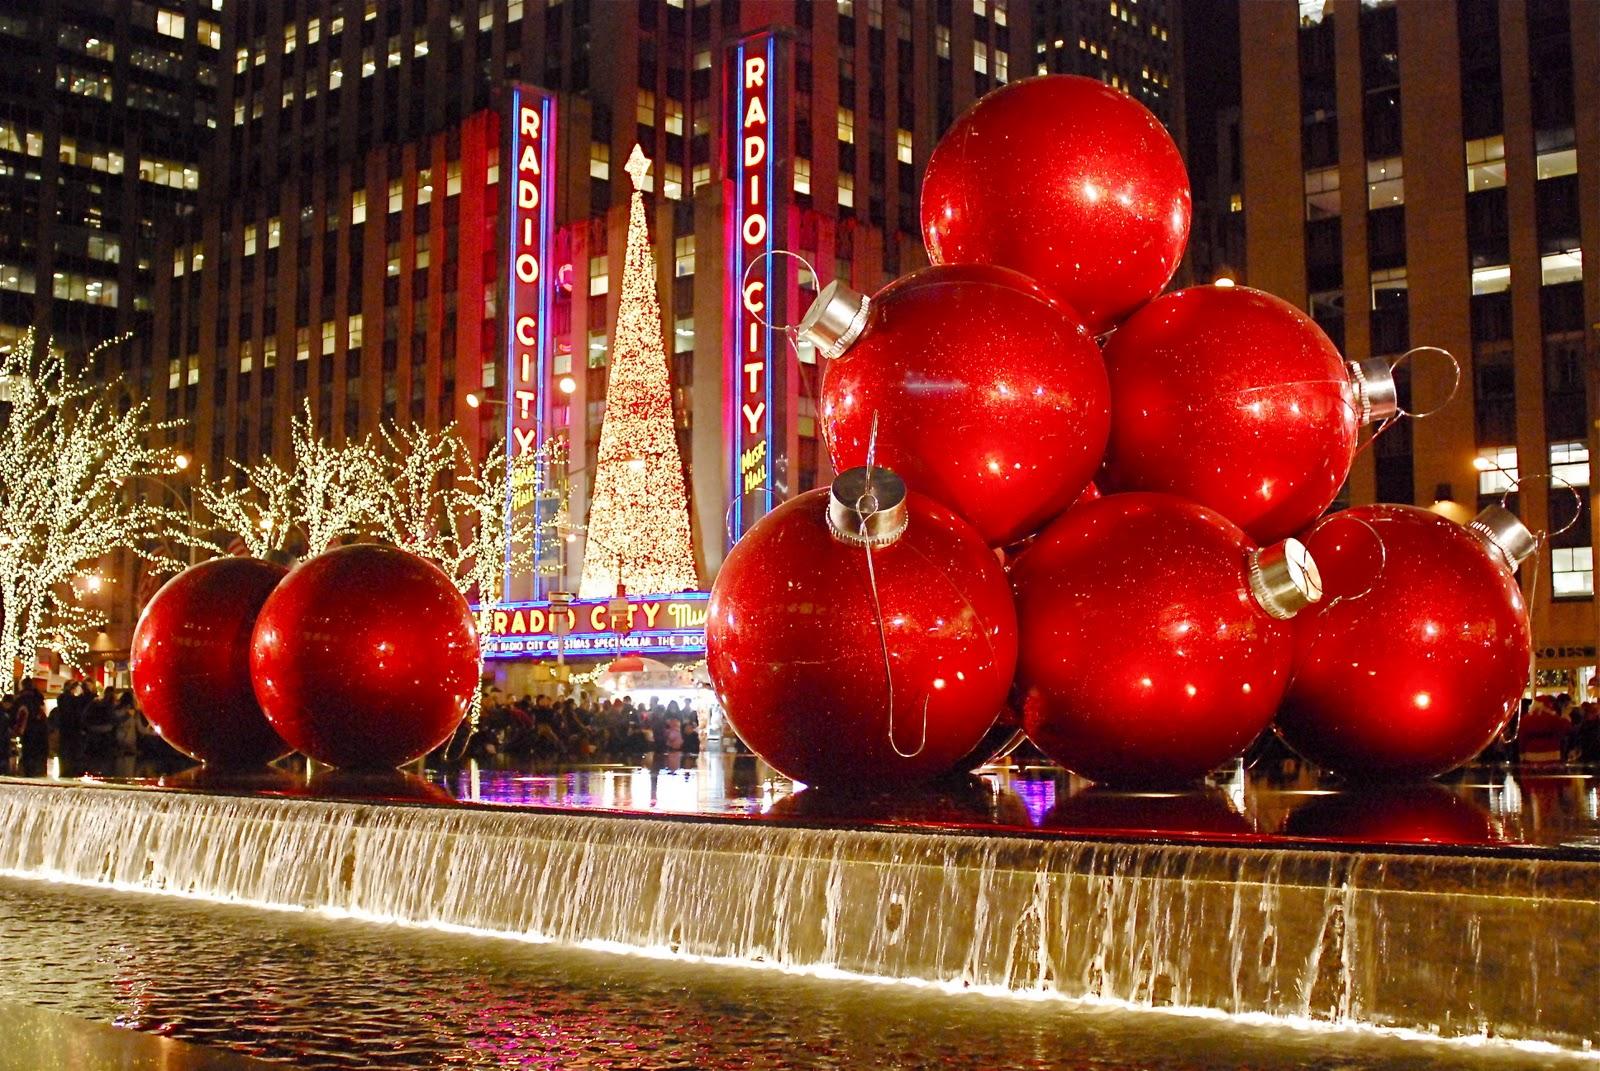 new york city christmas lights tour photo album patiofurn home new york city christmas lights tour photo album patiofurn home big christmas lights photo album